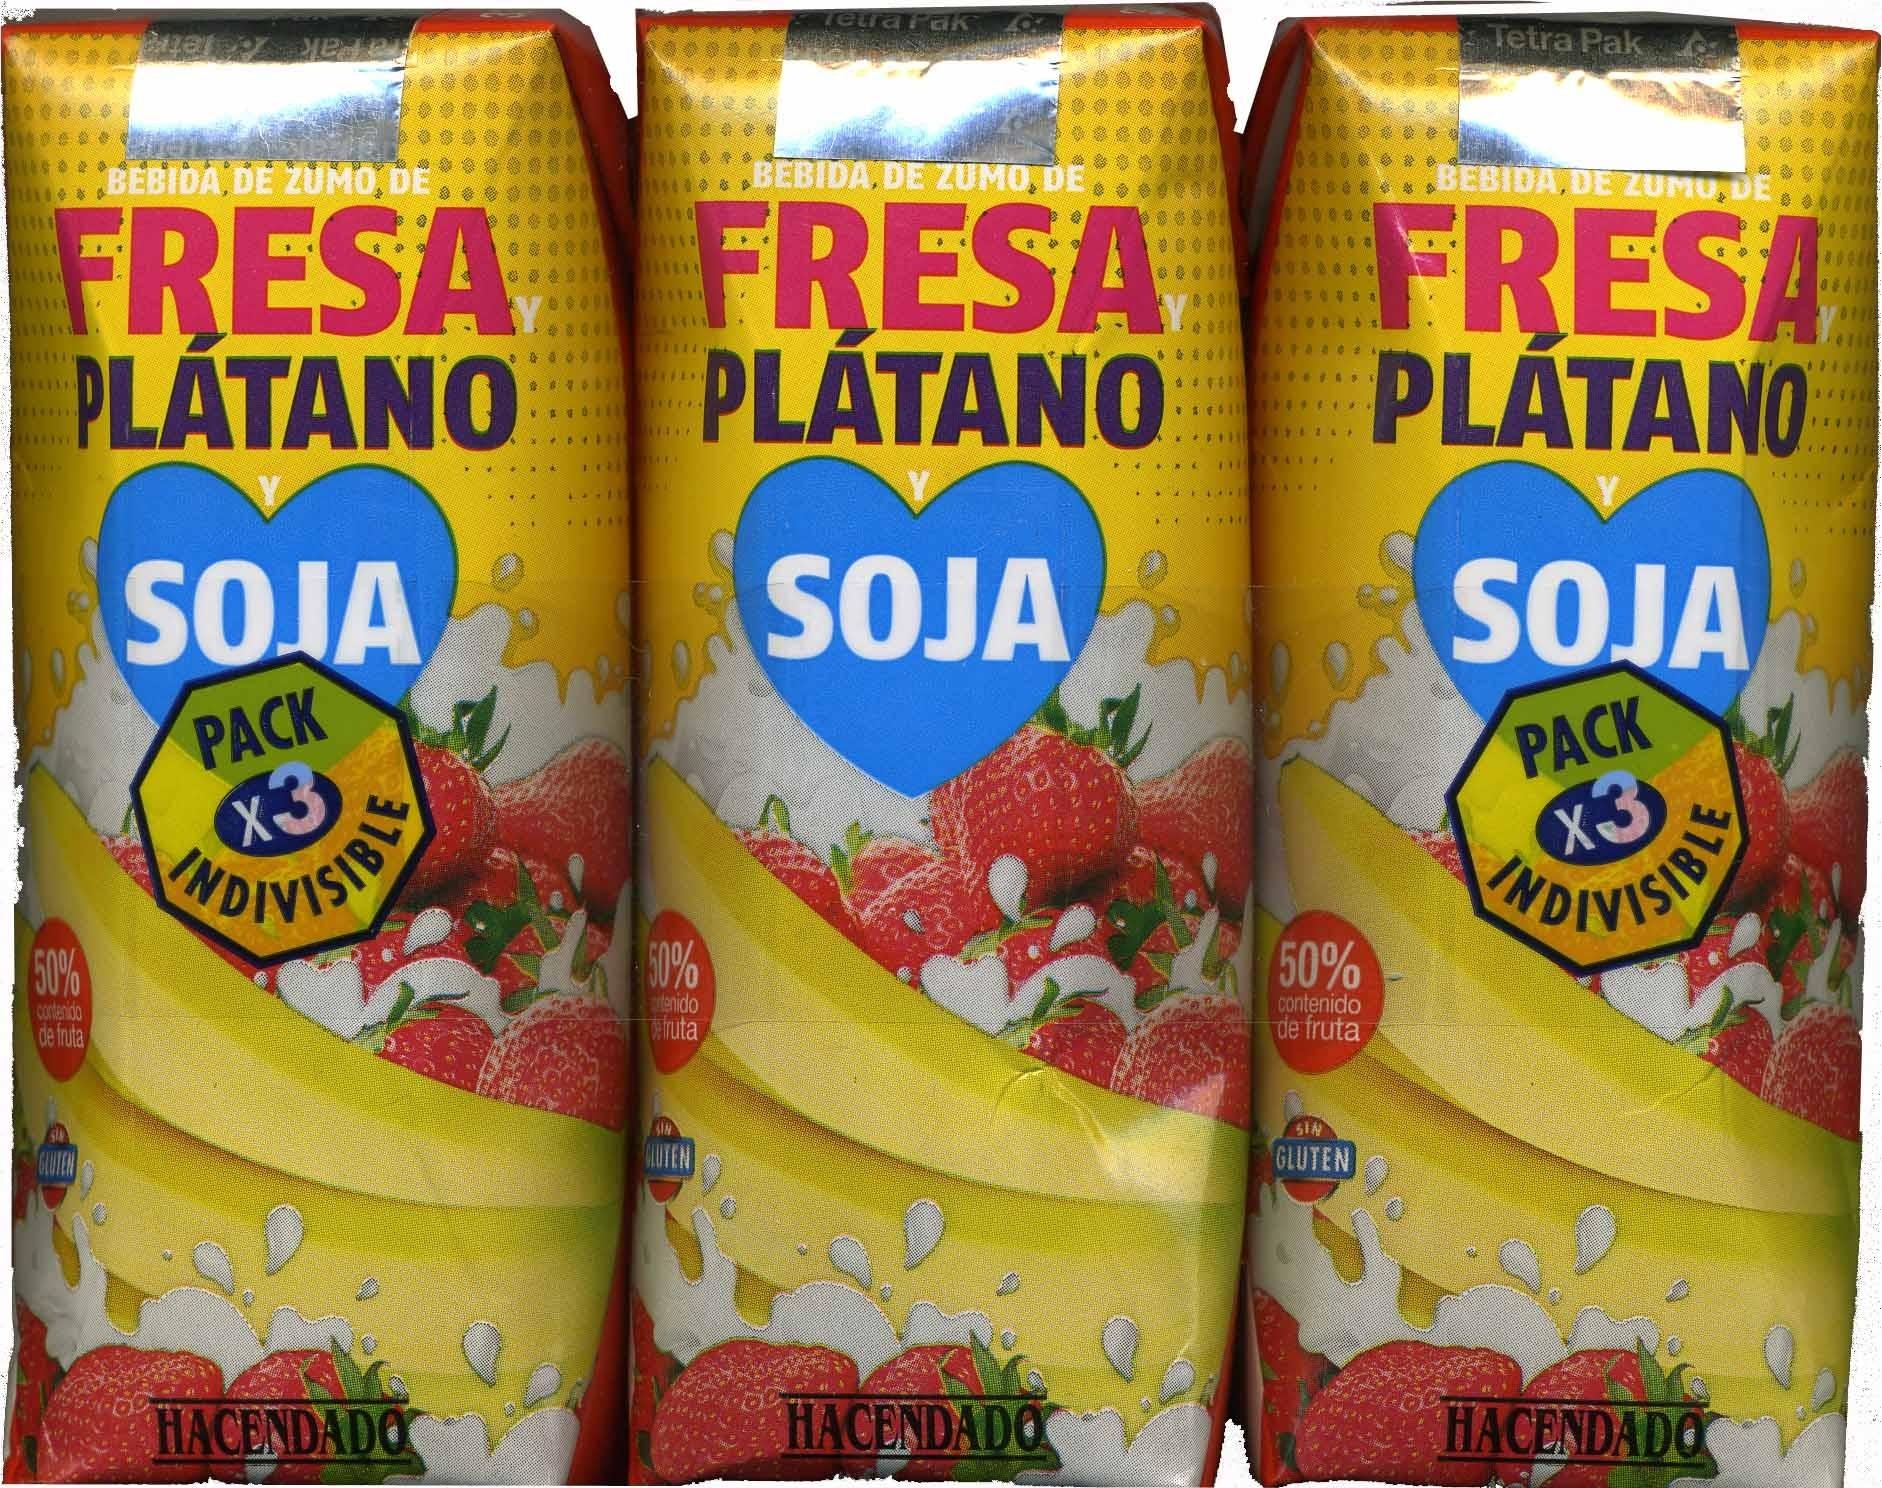 Bebida de zumo de fresa pl tano soja pack de 3 - Como hacer zumo de fresa ...